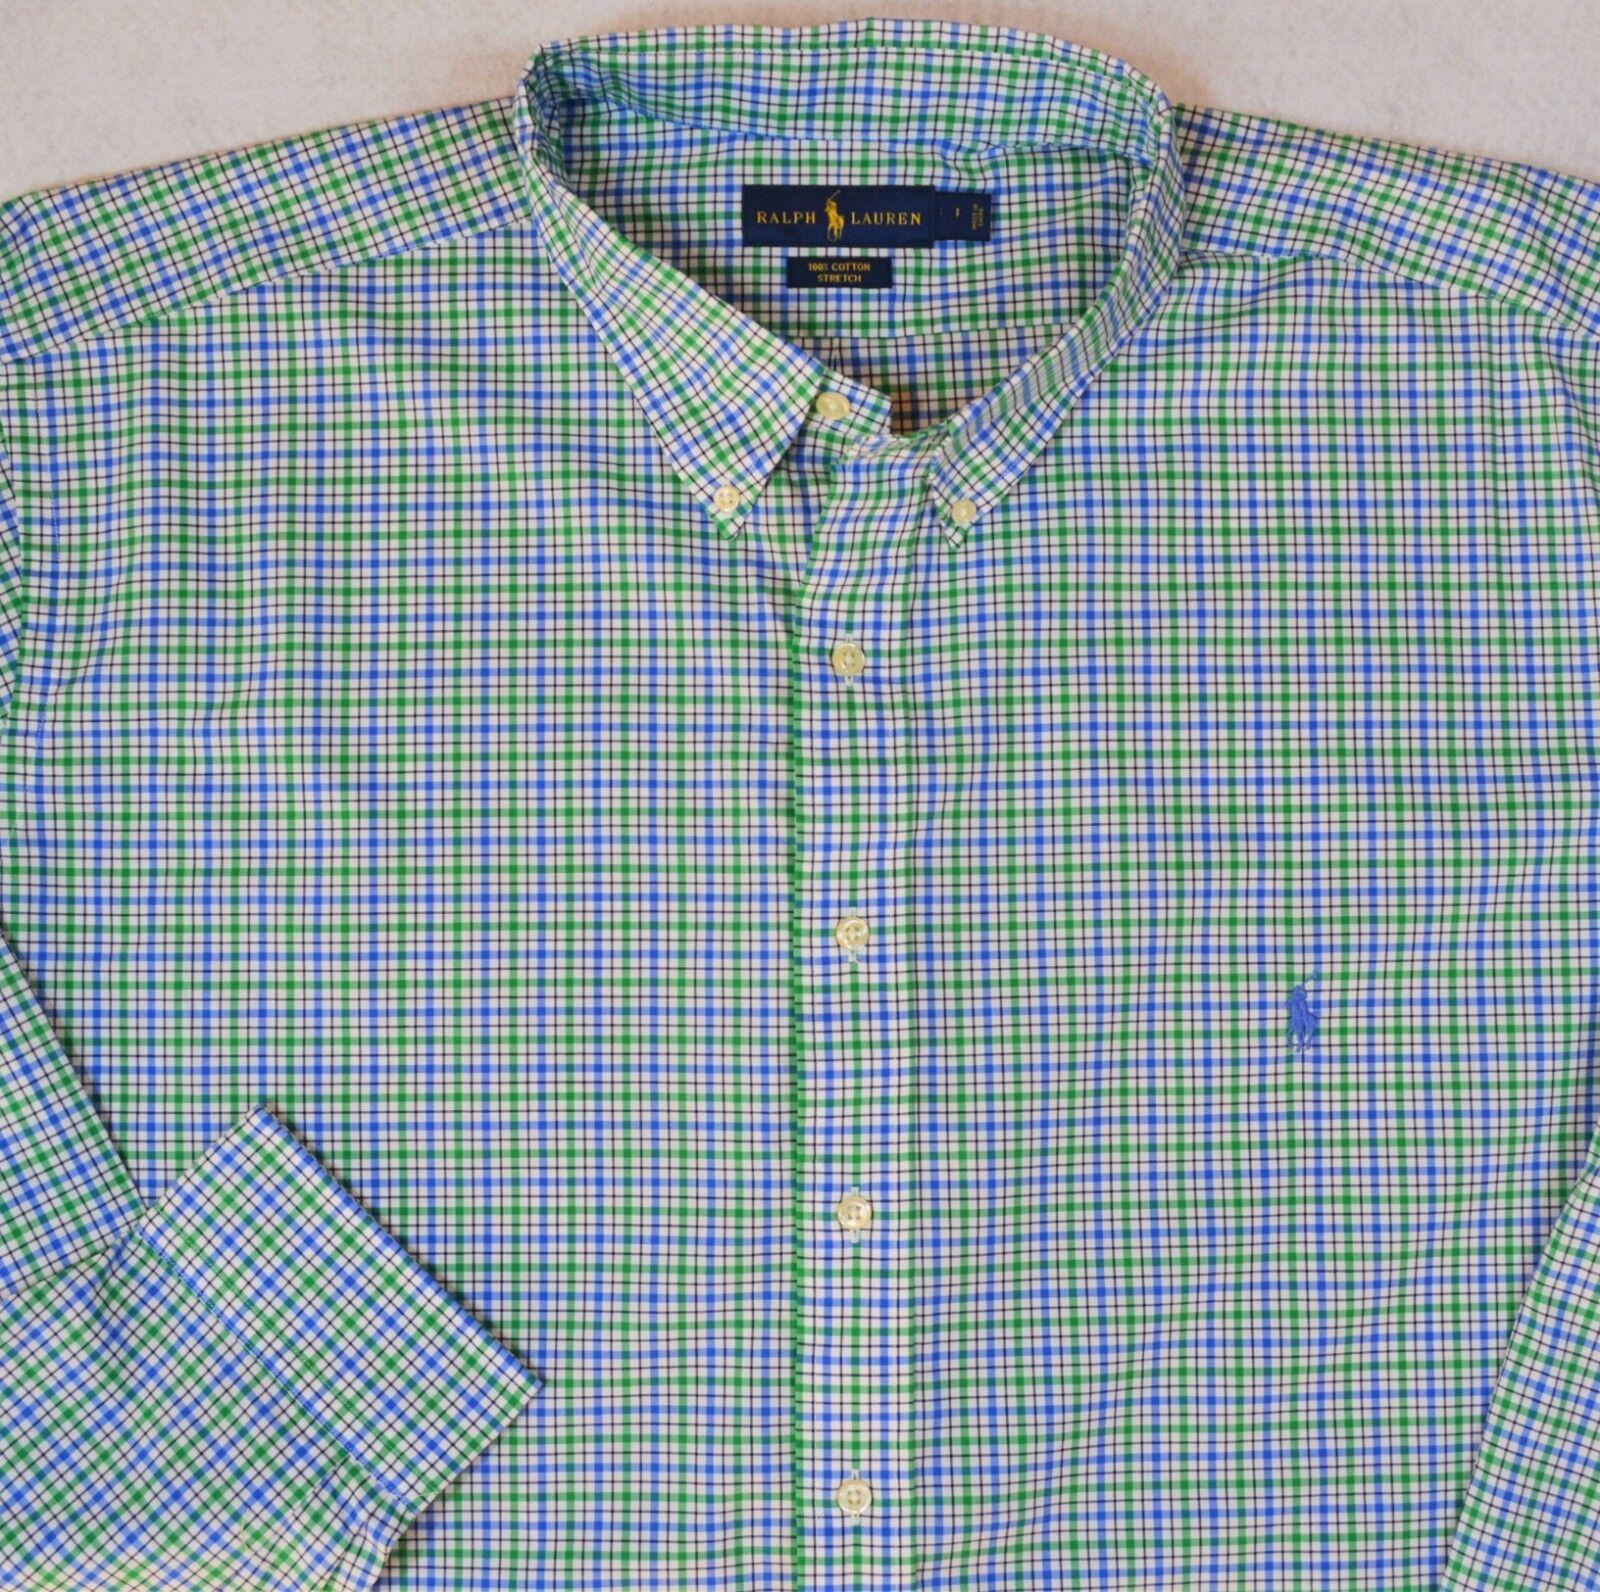 Ralph Lauren Plaid Stretch Button-Front Long Sleeves Shirt Sizes 2XLT 3XB NWT